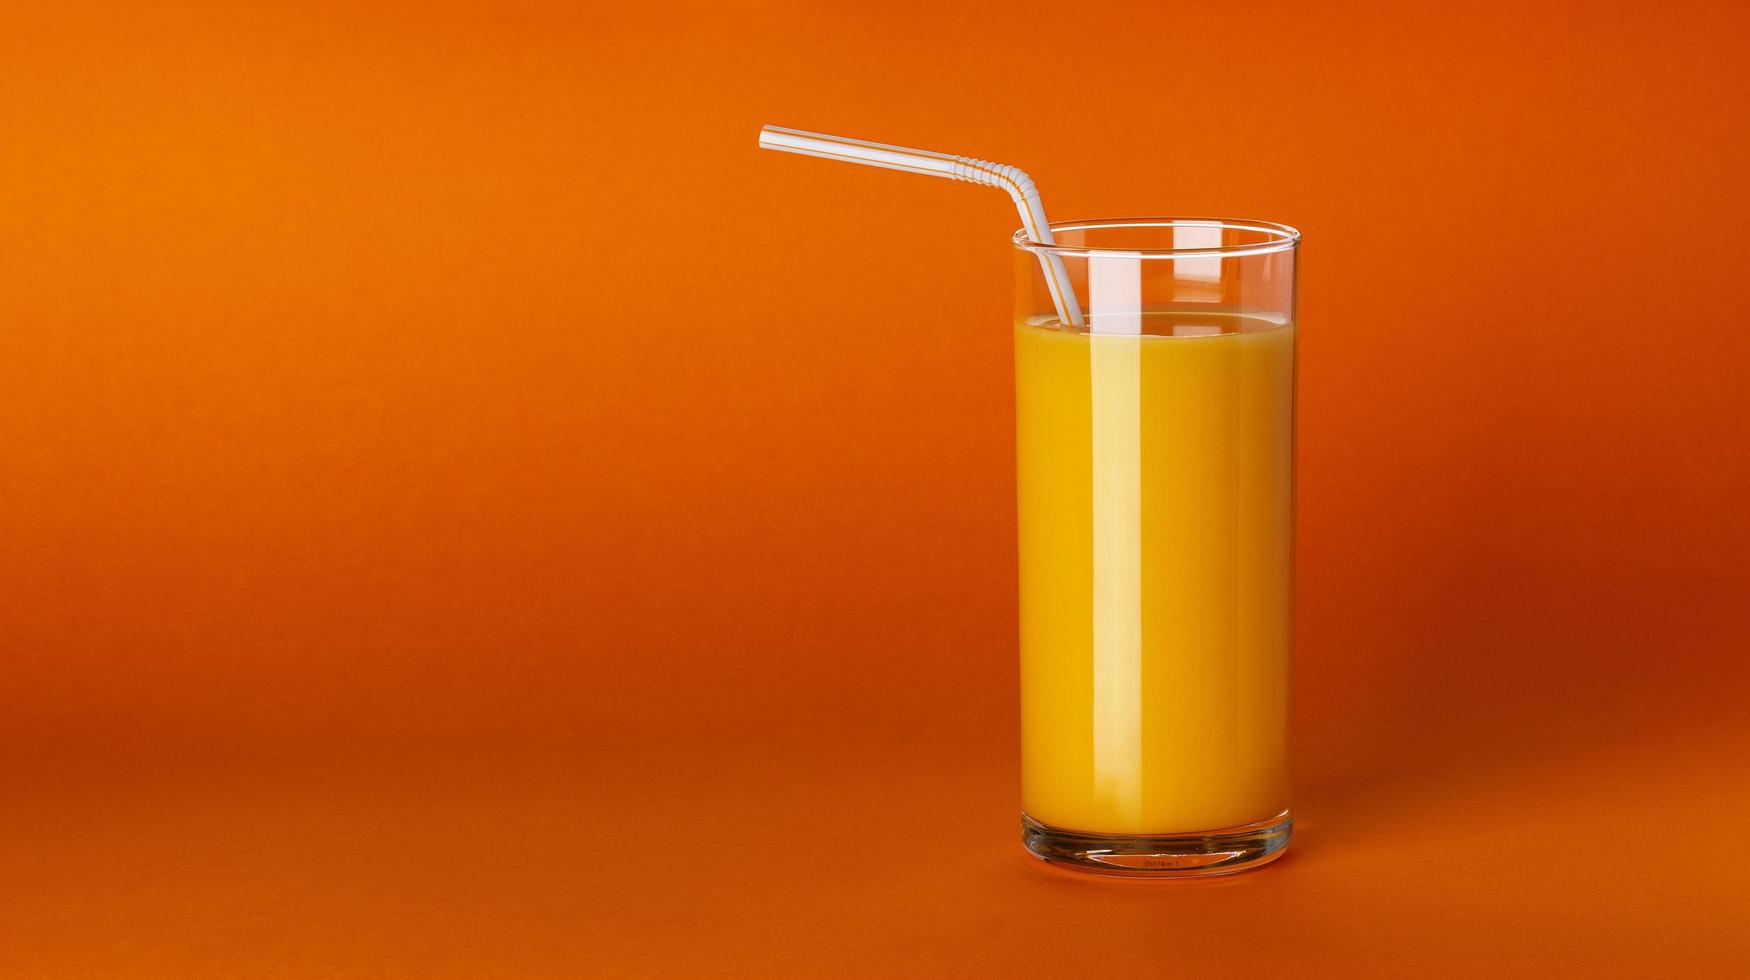 ett glas apelsinjuice på orange bakgrund med kopieringsutrymme foto